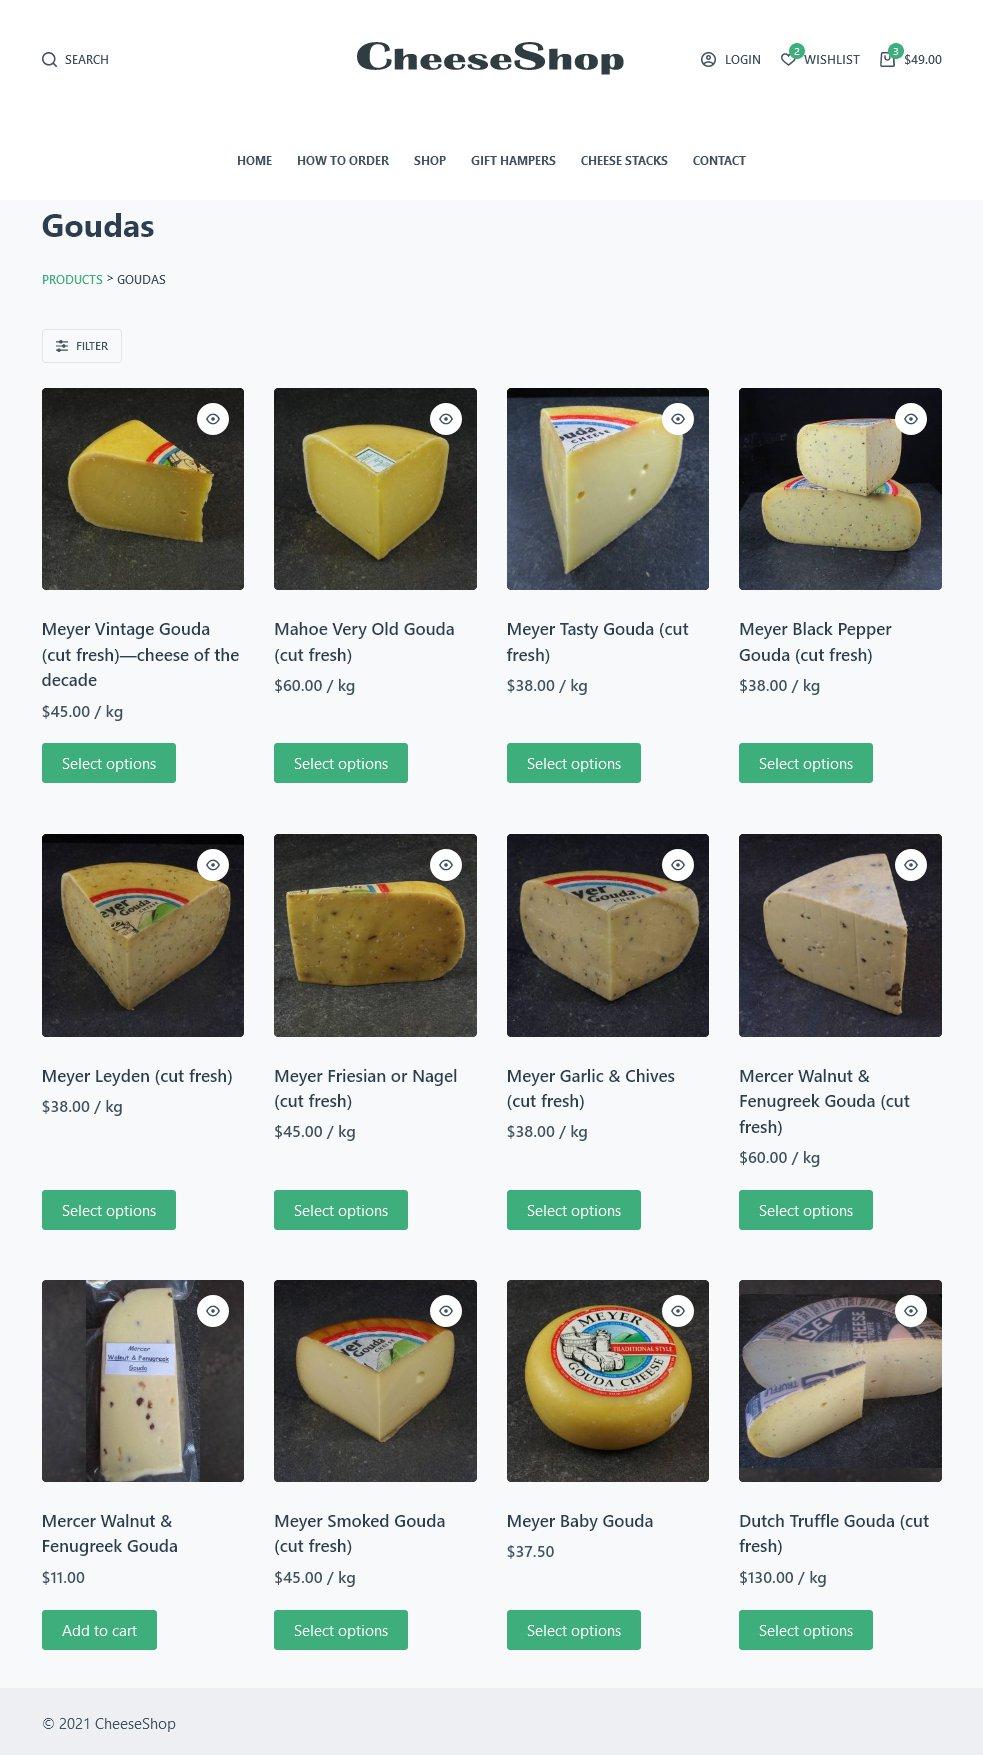 Skylark Design sample CheeseShop website